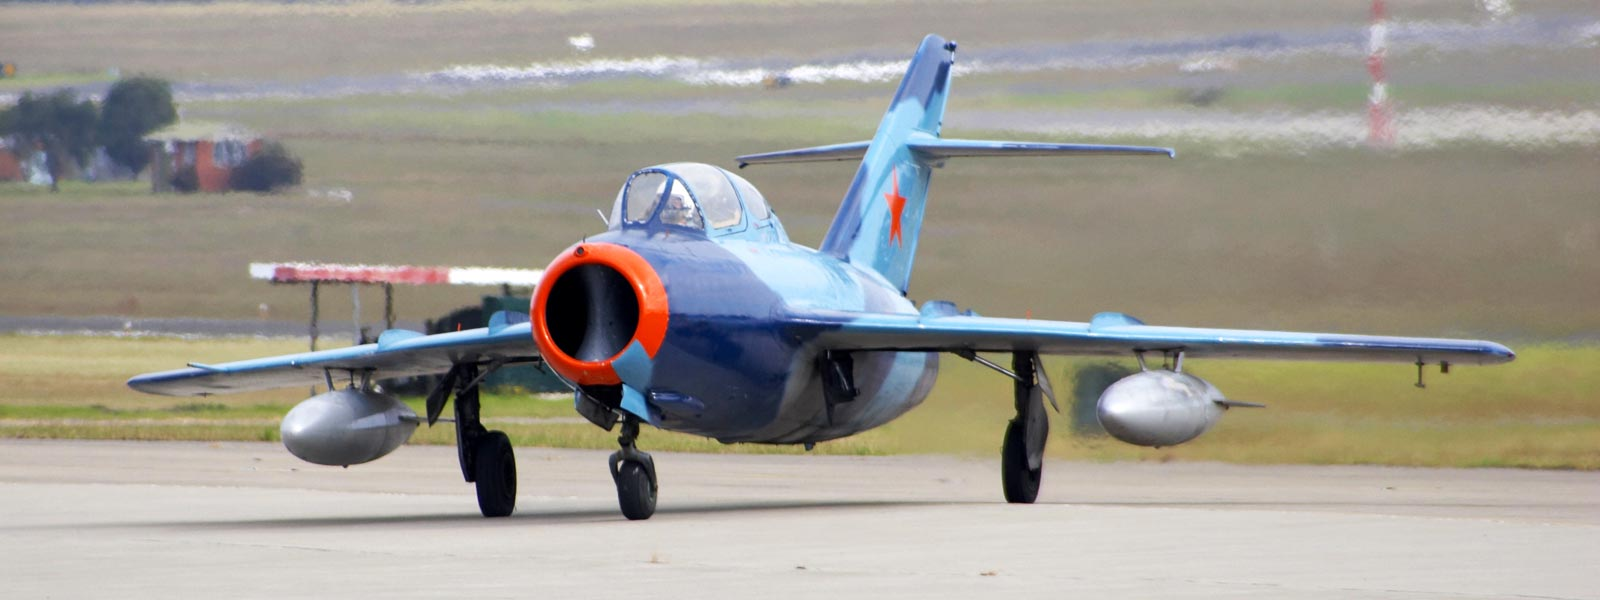 Fly a MiG-15 Fighter Jet